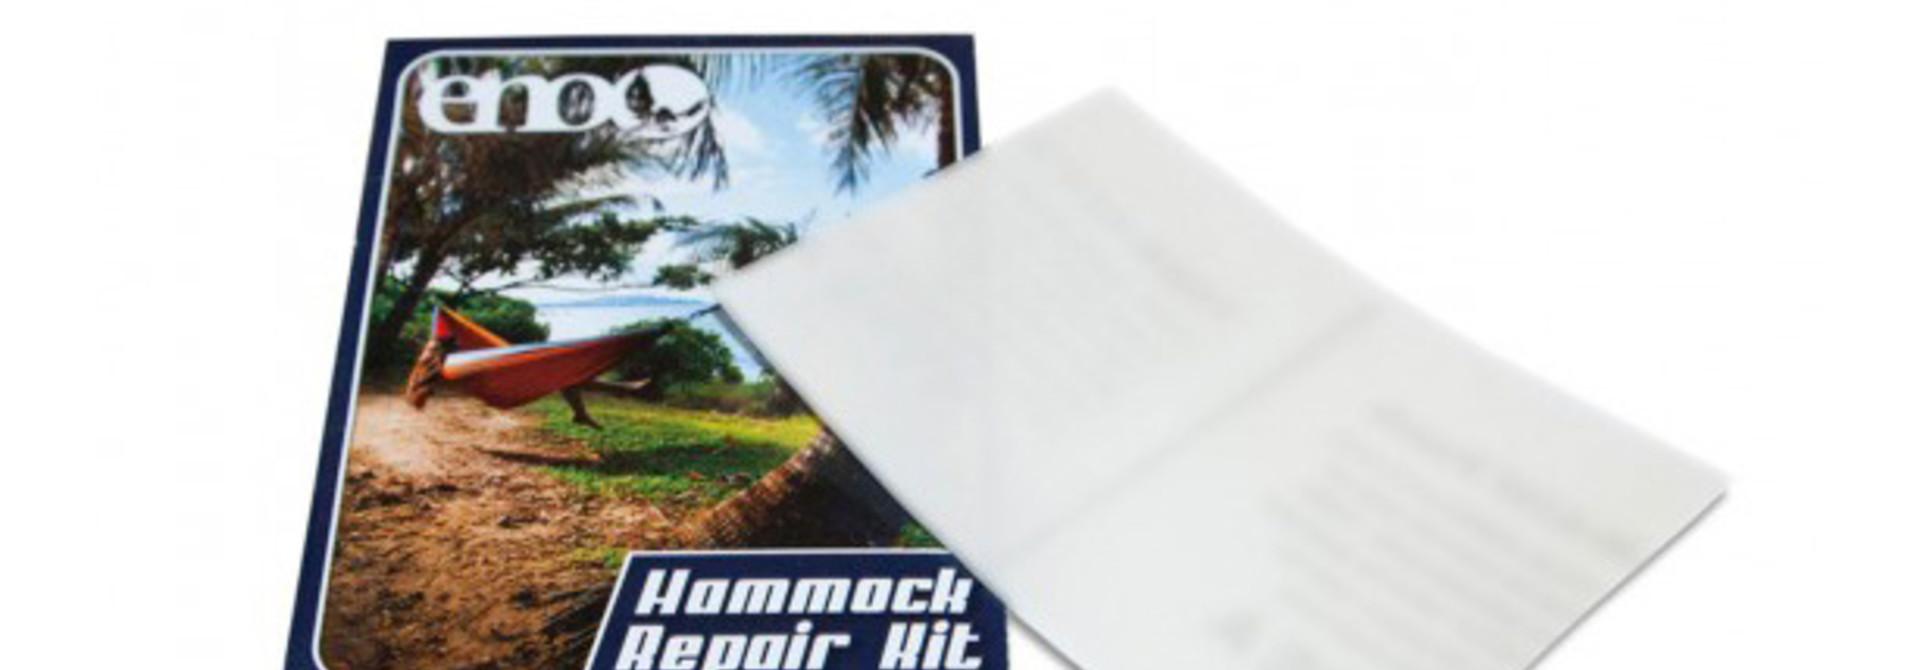 Hammock Repair Kit